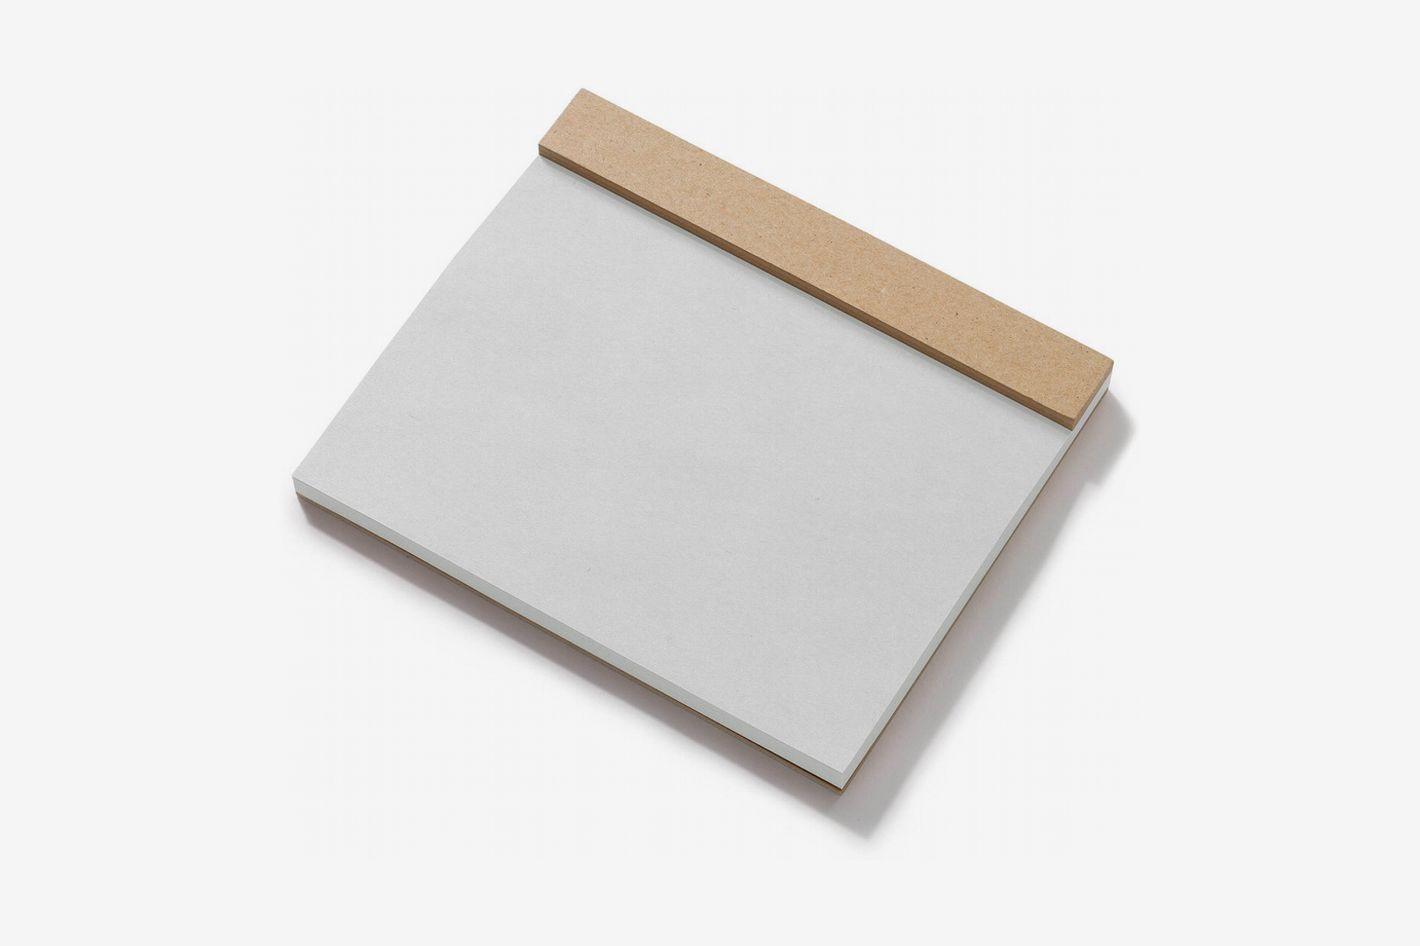 Ito Bindery A5 Paper Pad